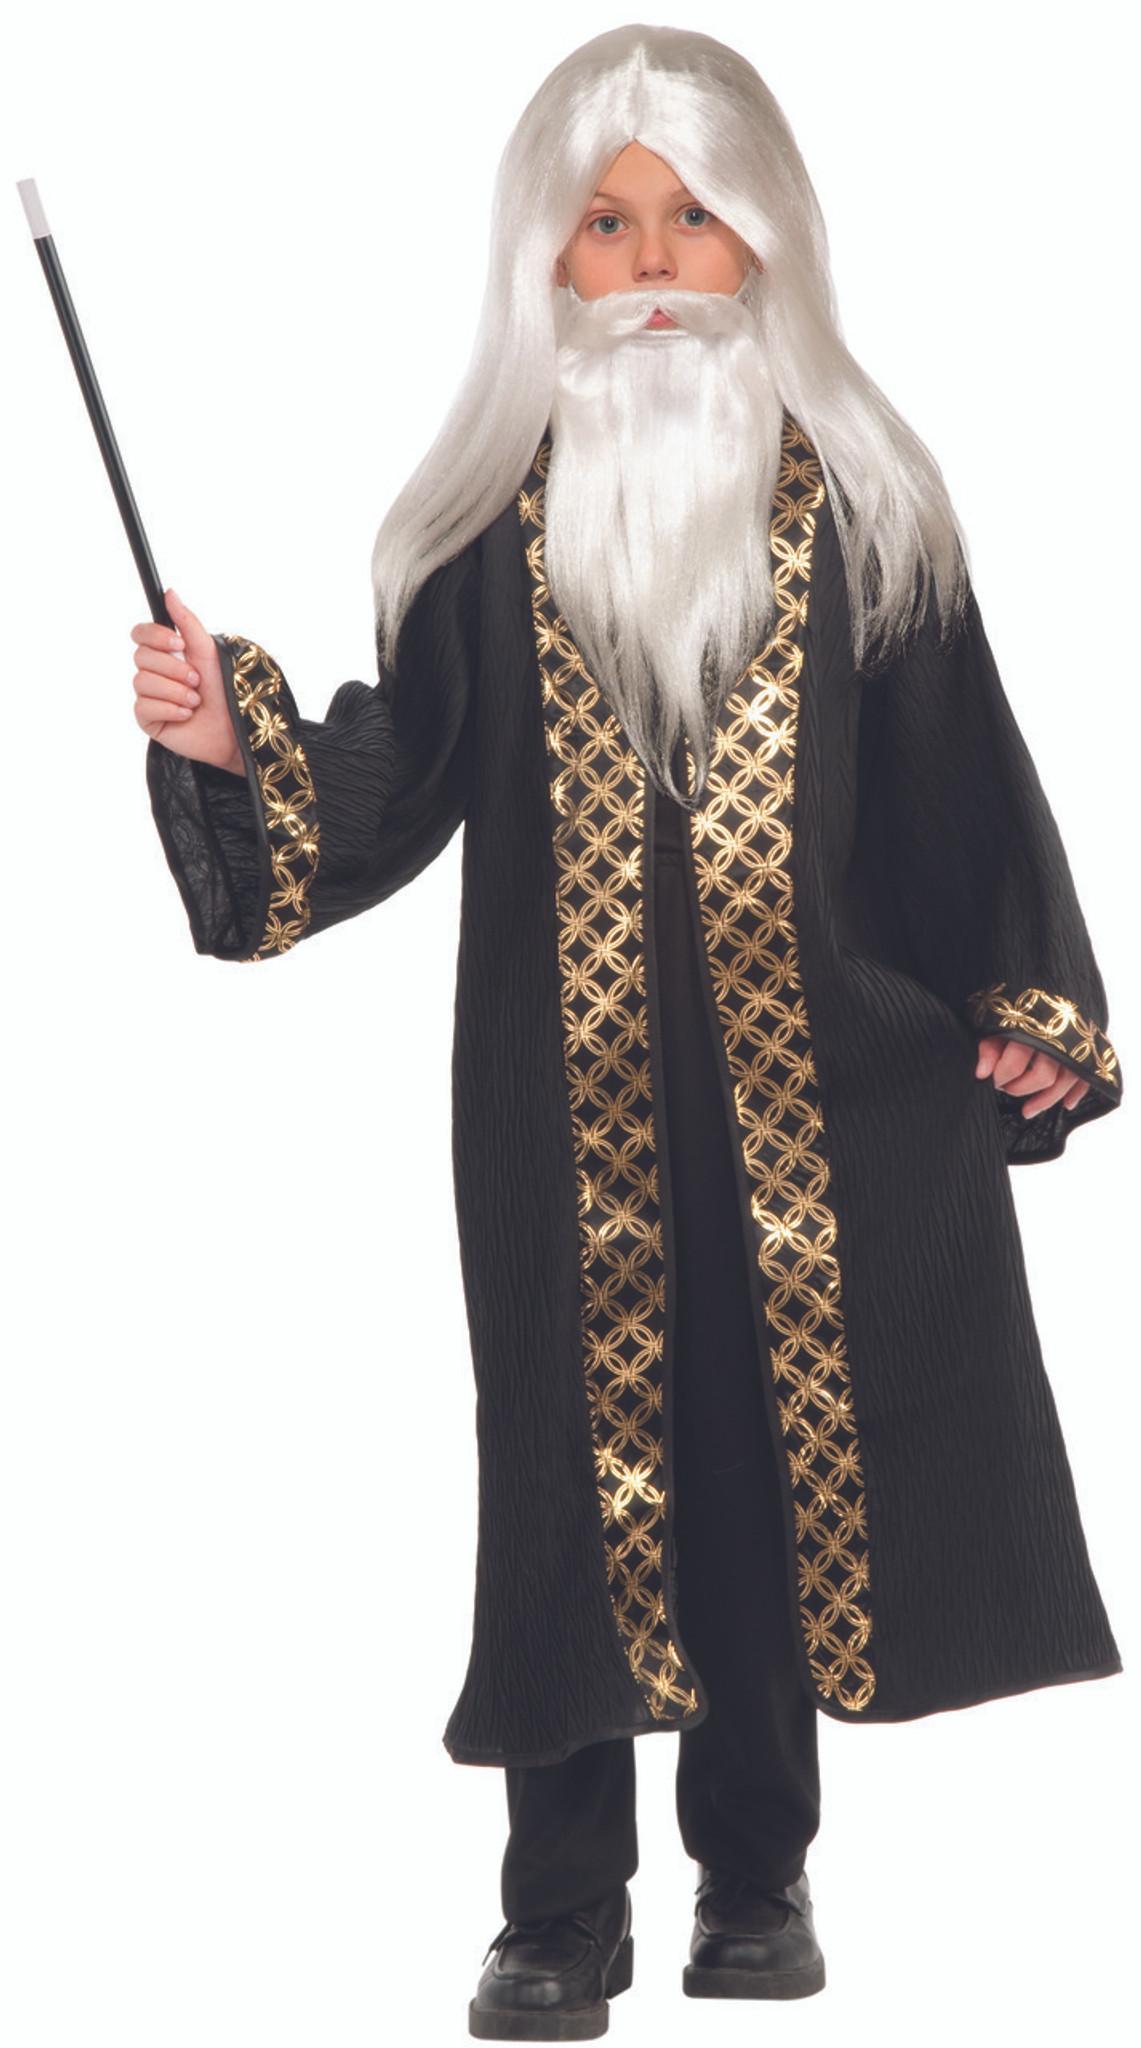 Wizard White Long Mustache Beard Boys Child Costume Wig Set